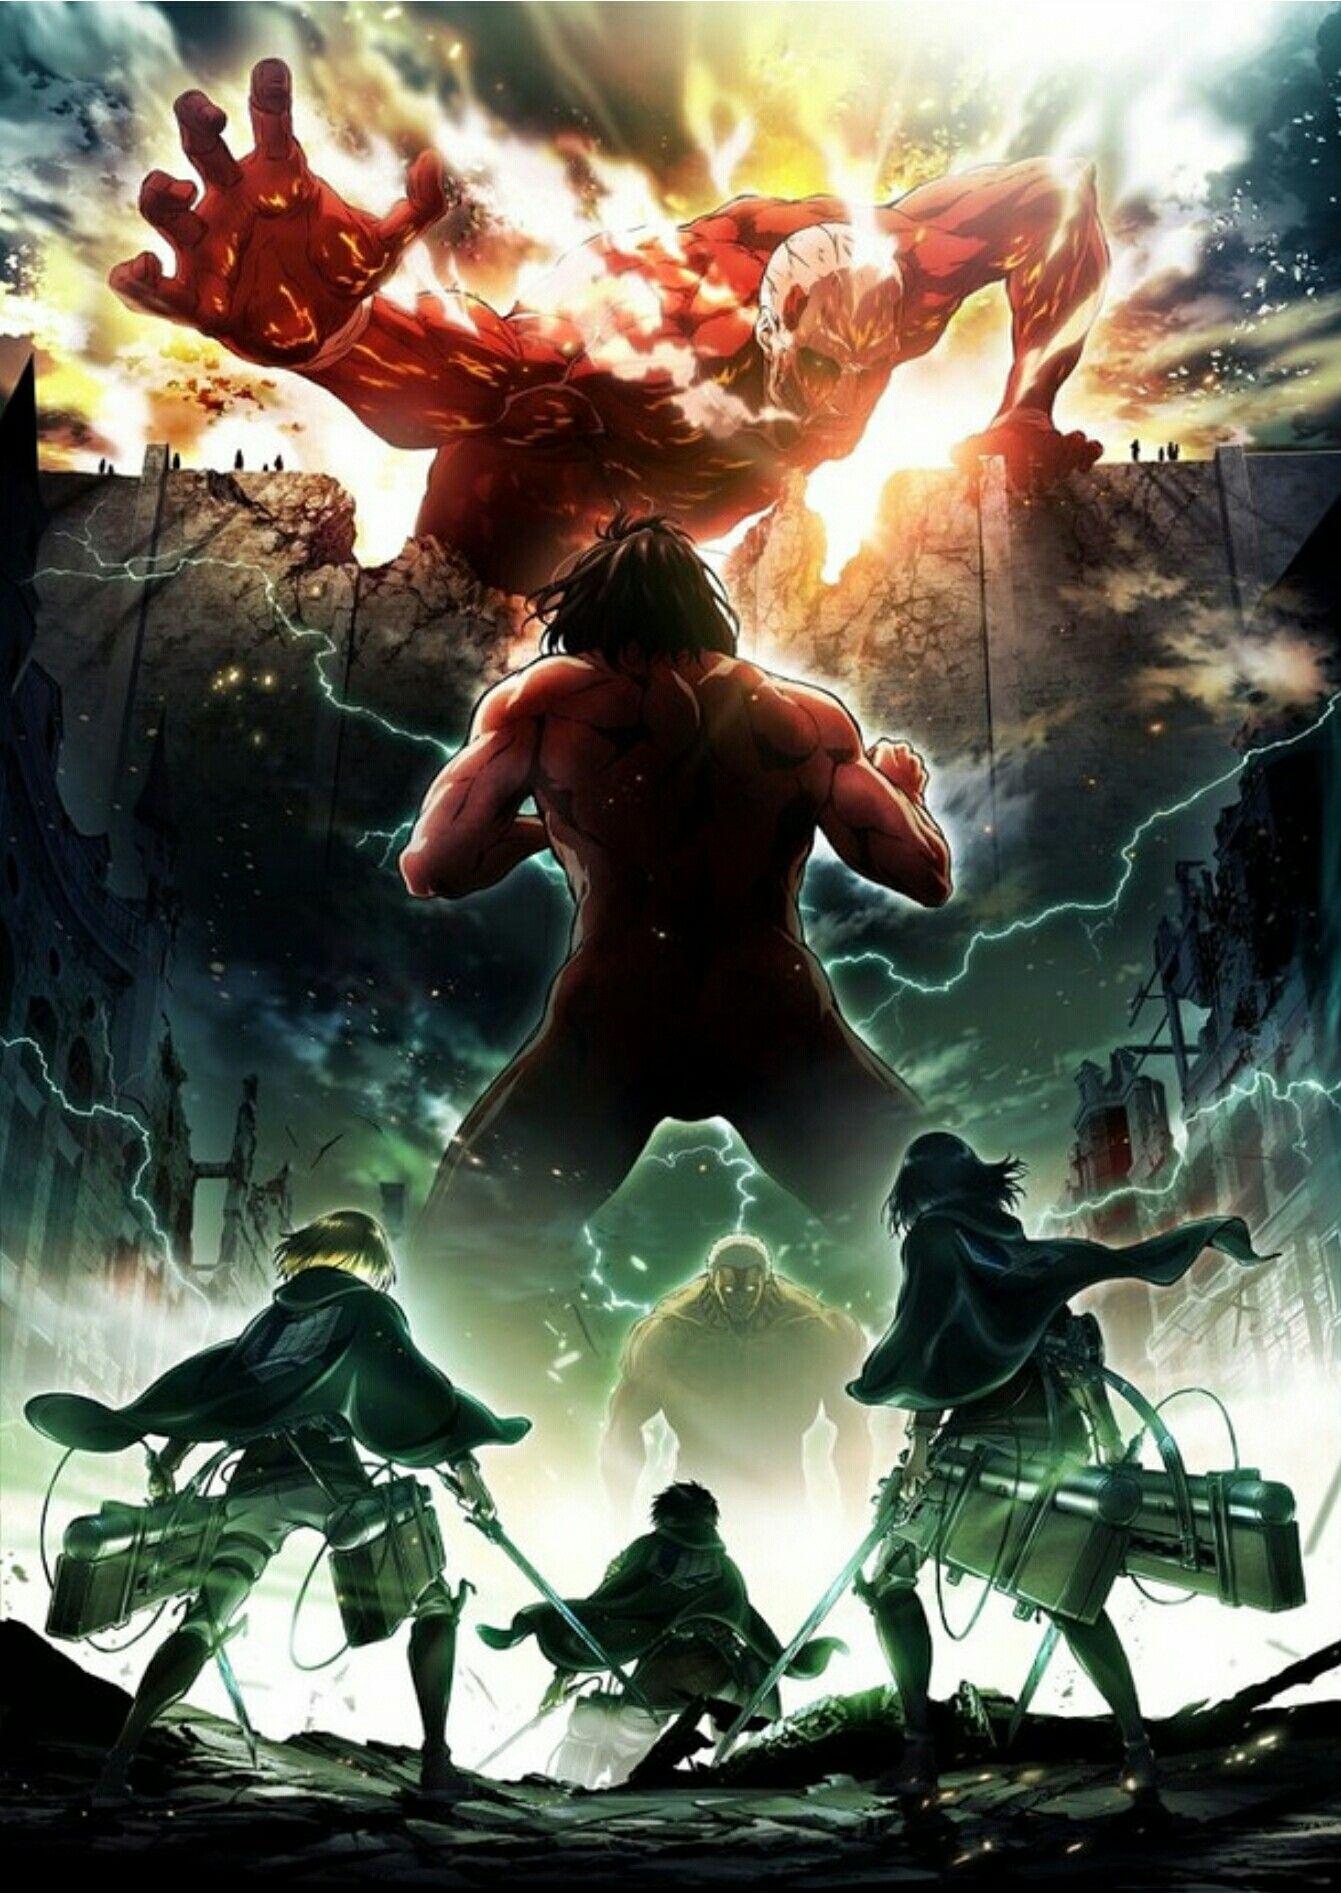 Armin eren mikasa levi titan form titans colossal titan wall cool season 2 poster attack on titan